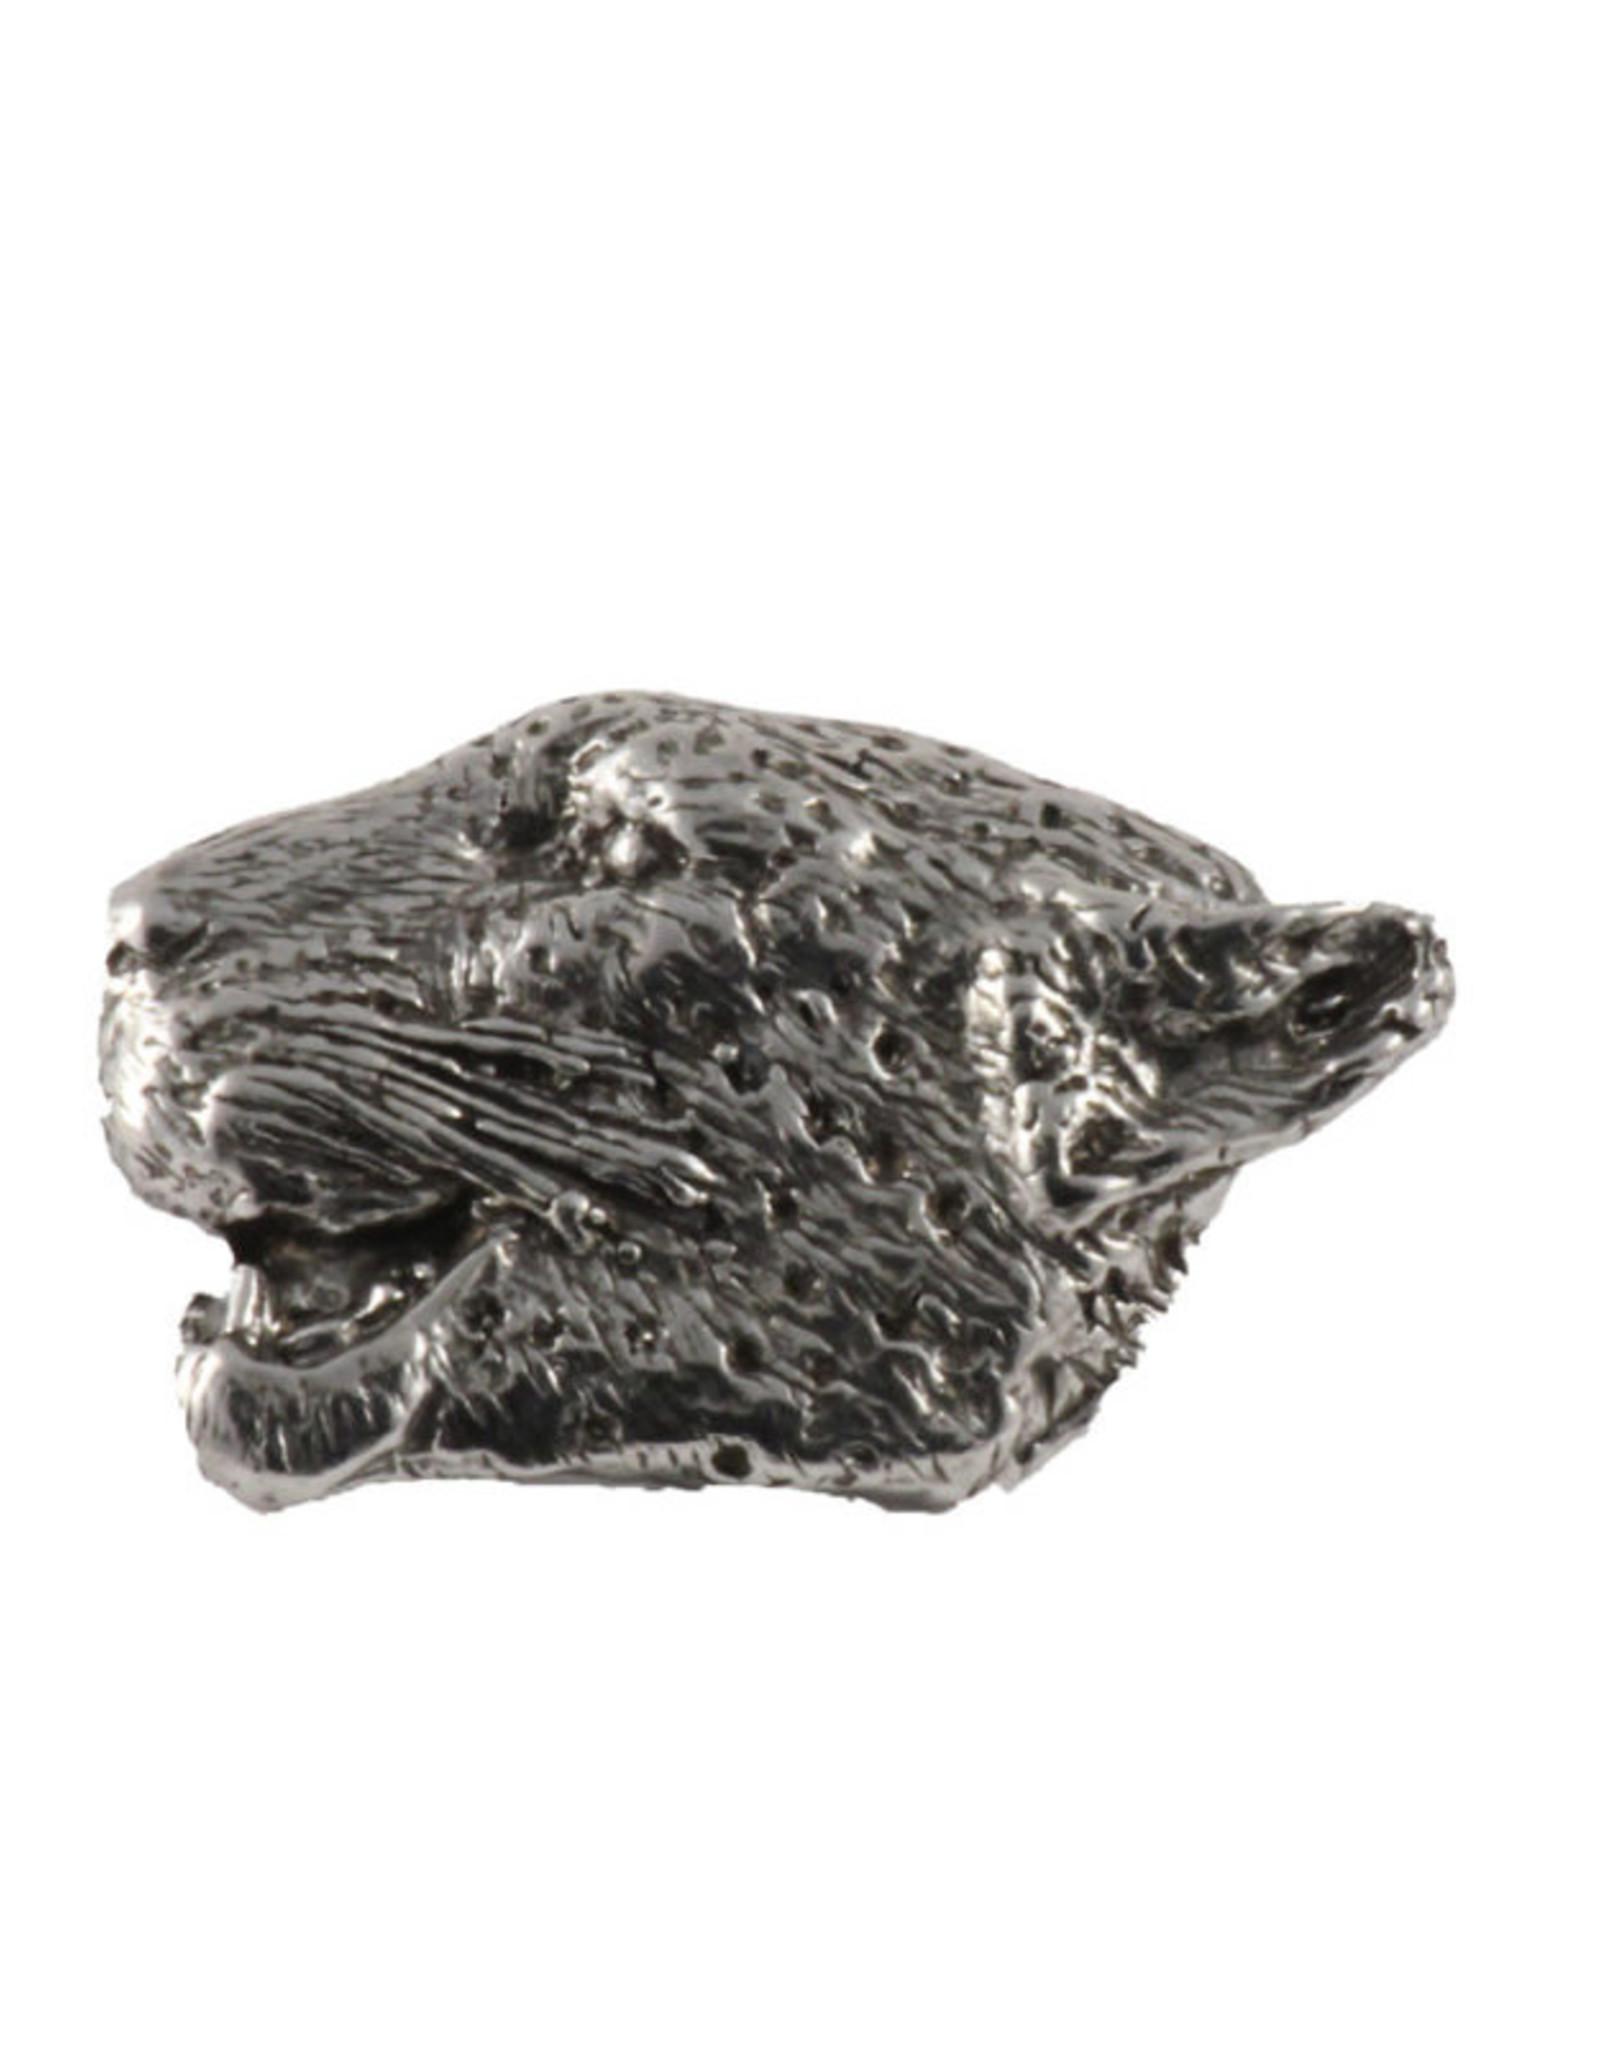 Pewter Leopard Pin/Brooch